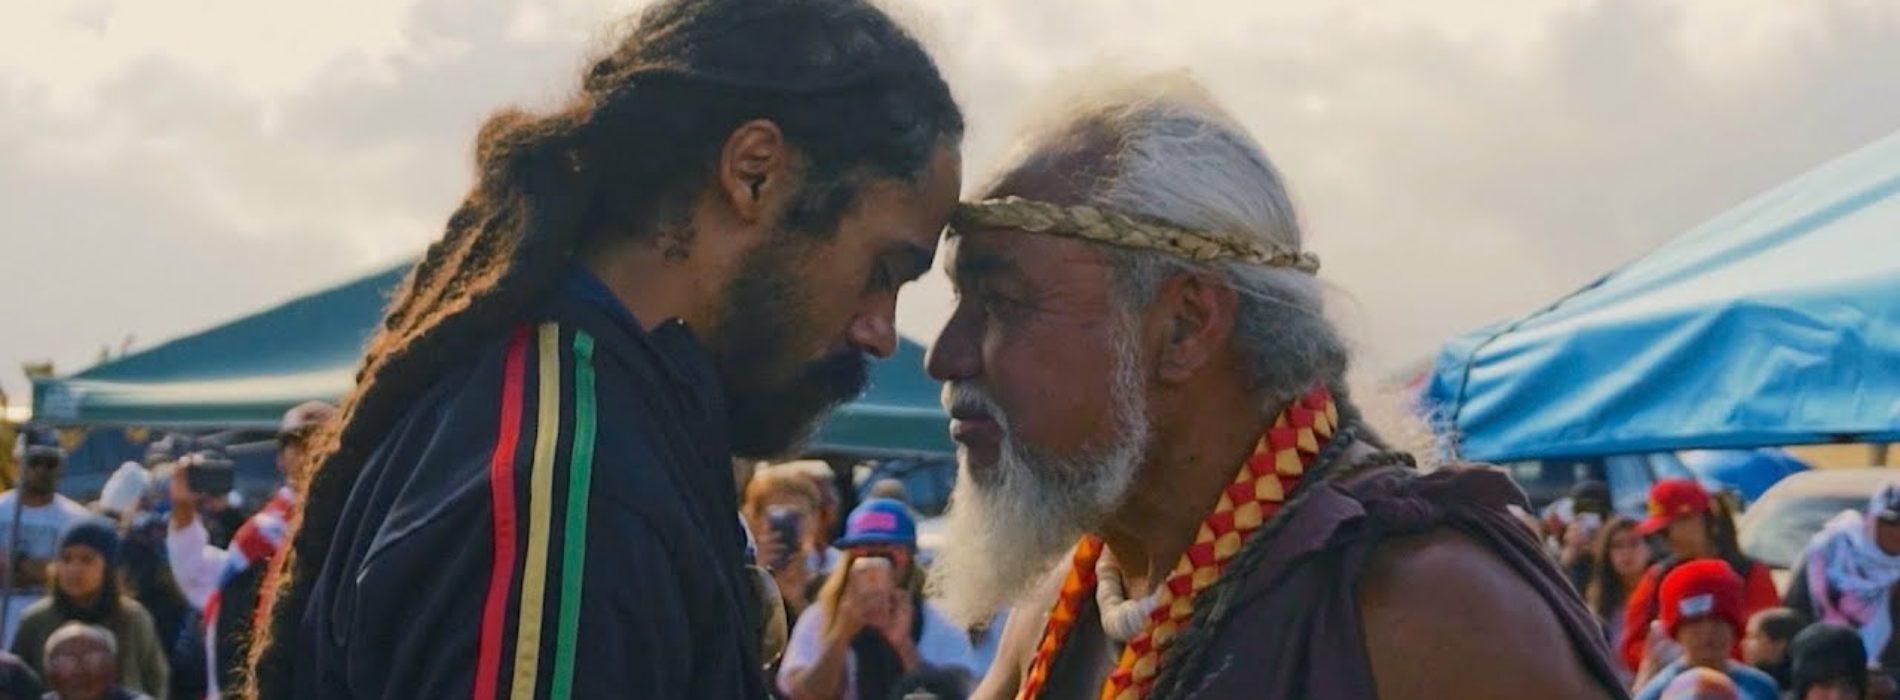 "Protect Mauna Kea – Damian ""Jr. Gong"" Marley – Août 2019"